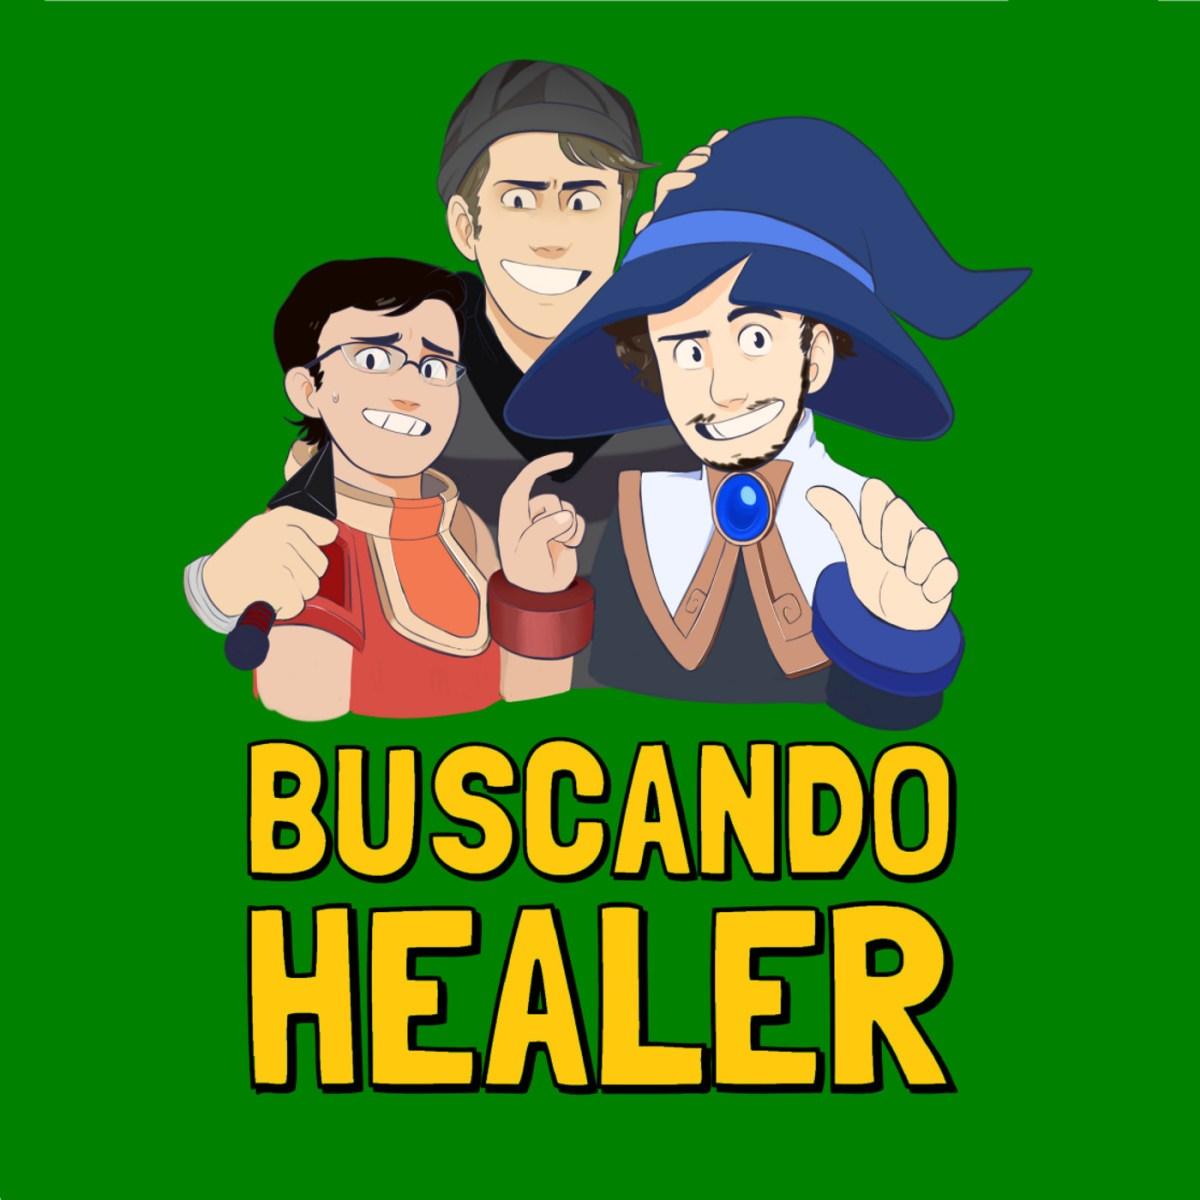 Buscando Healer